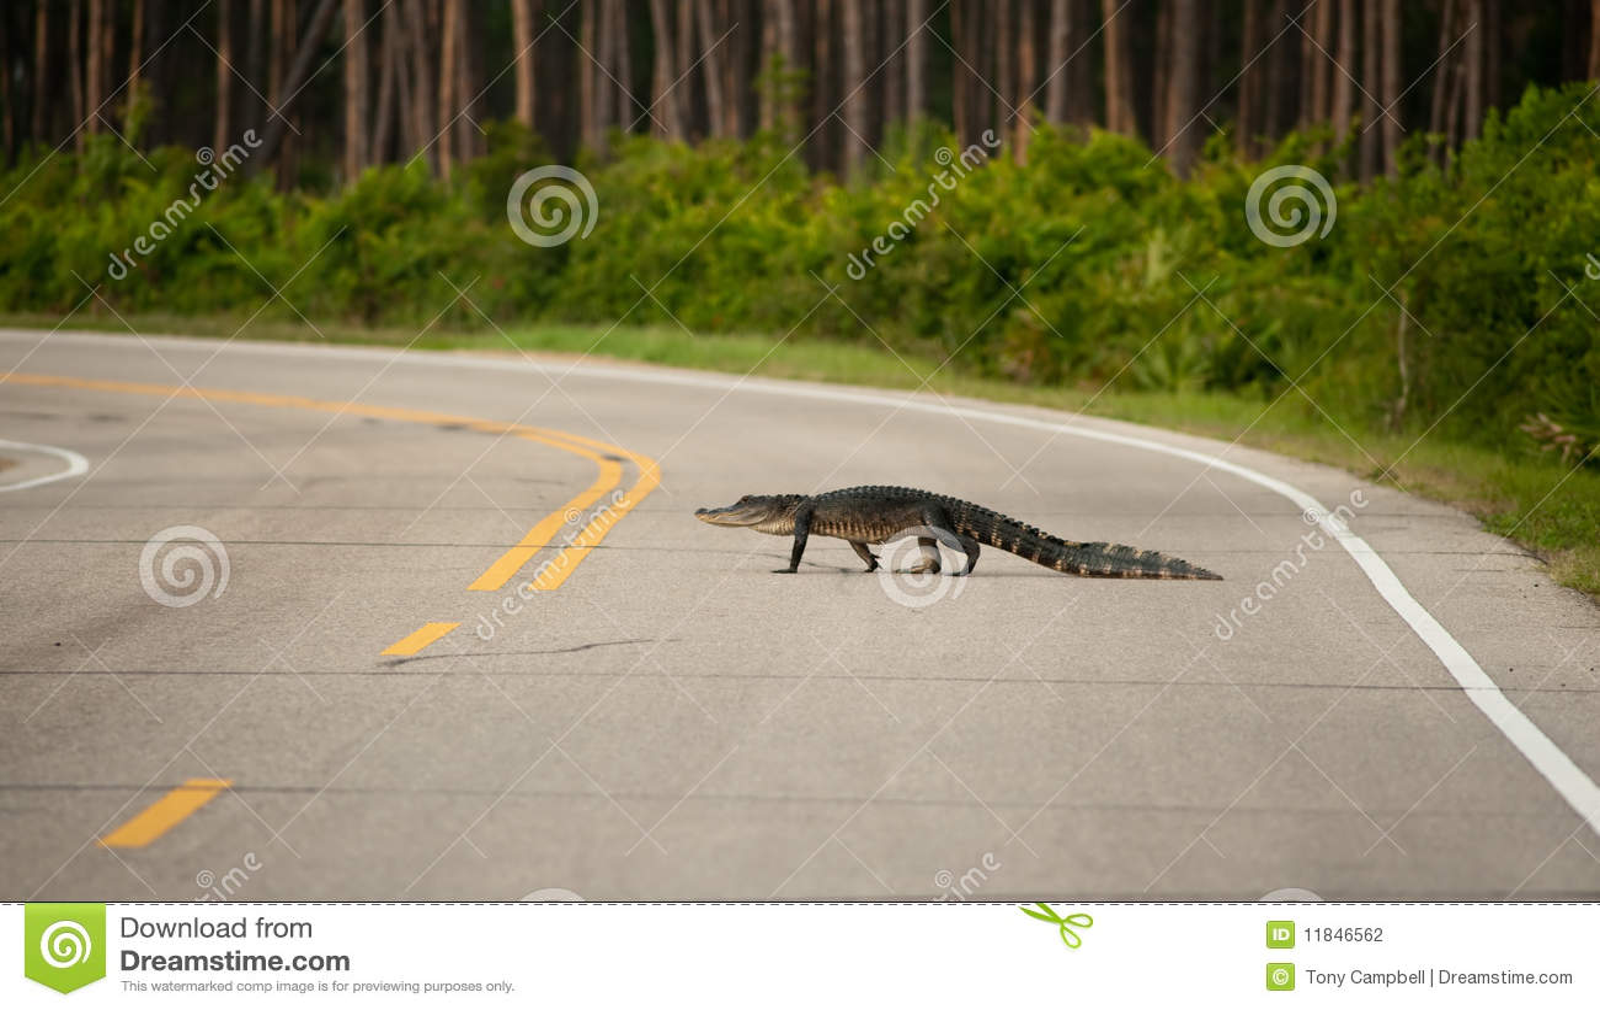 Alligator crossing the road